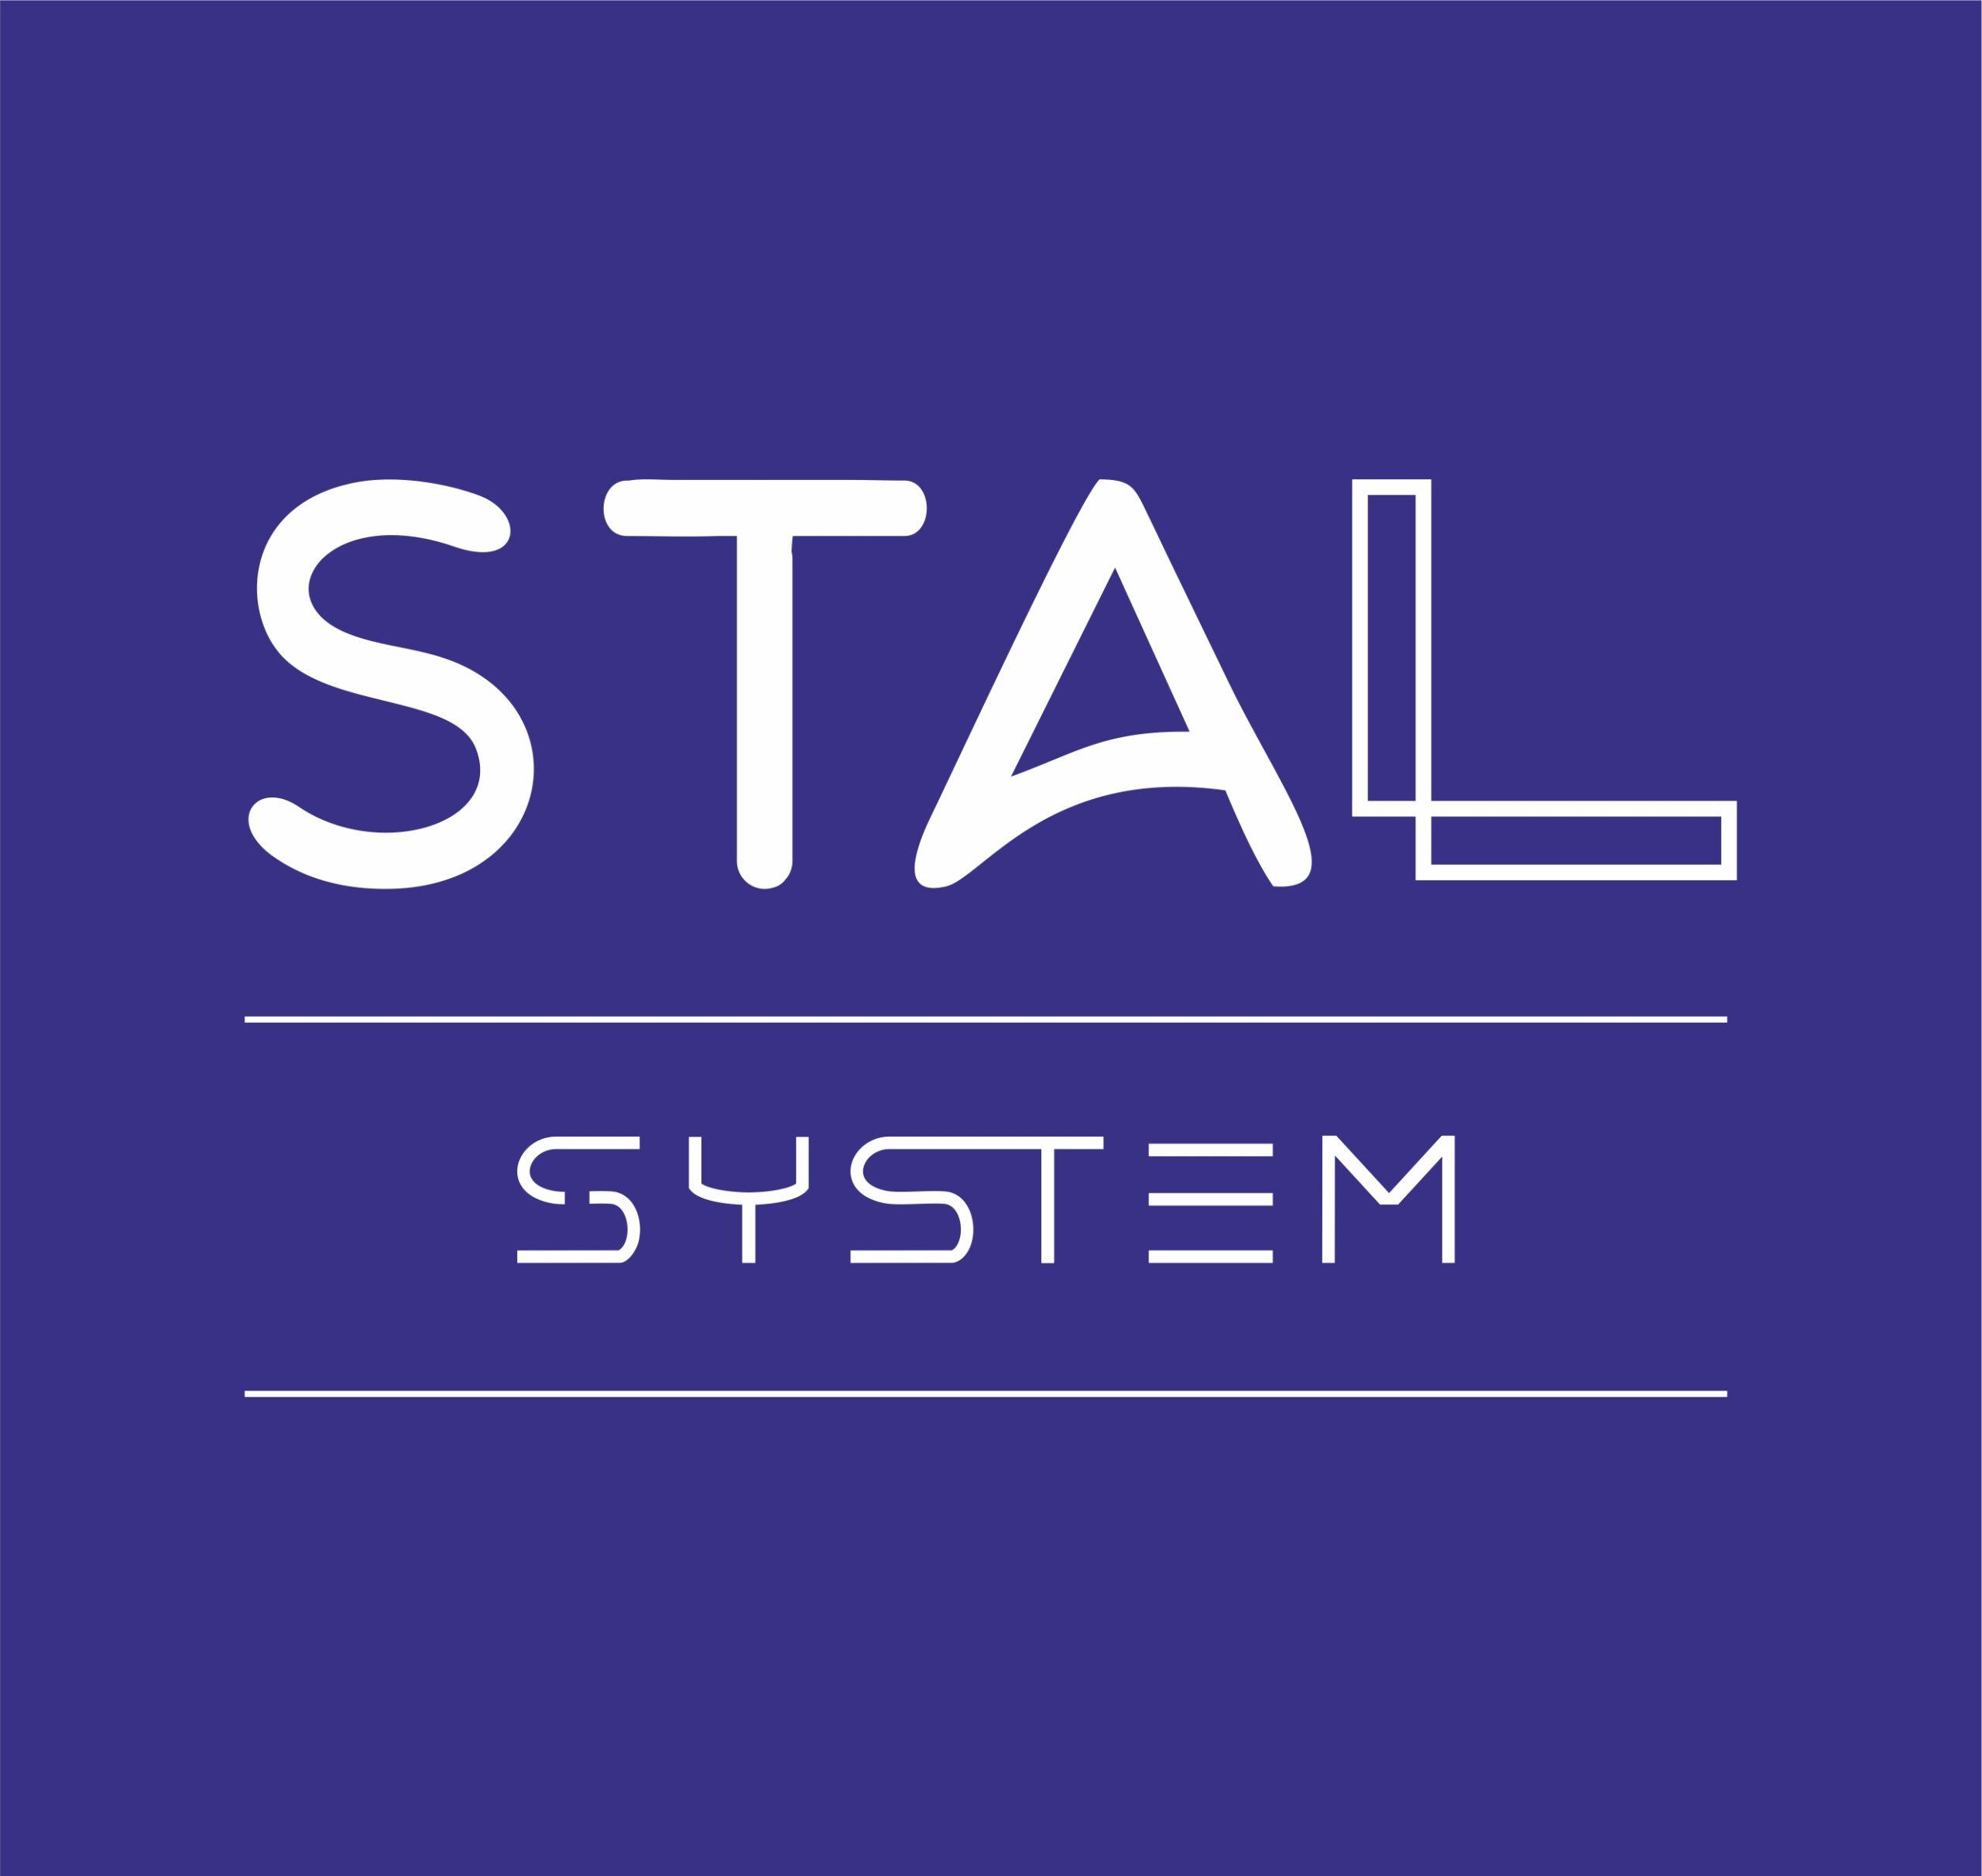 stal system